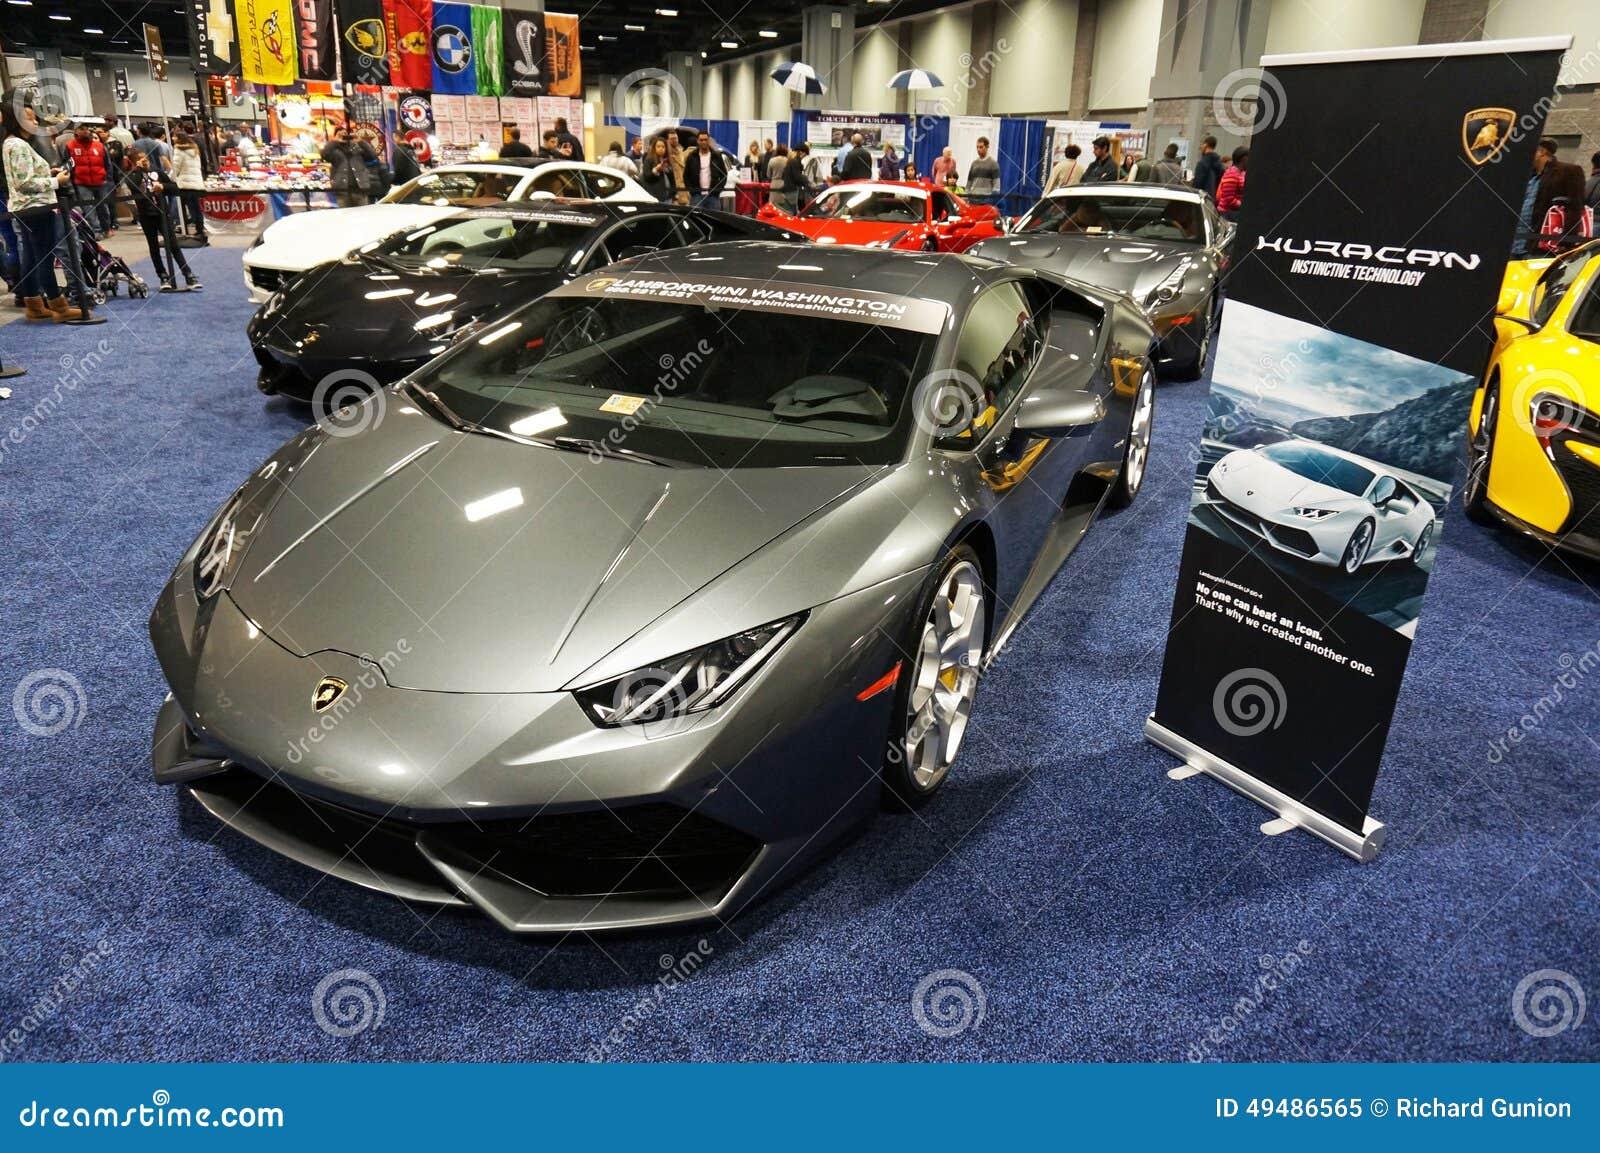 202 602 2015 237250 auto car center convention grey has huracan lamborghini